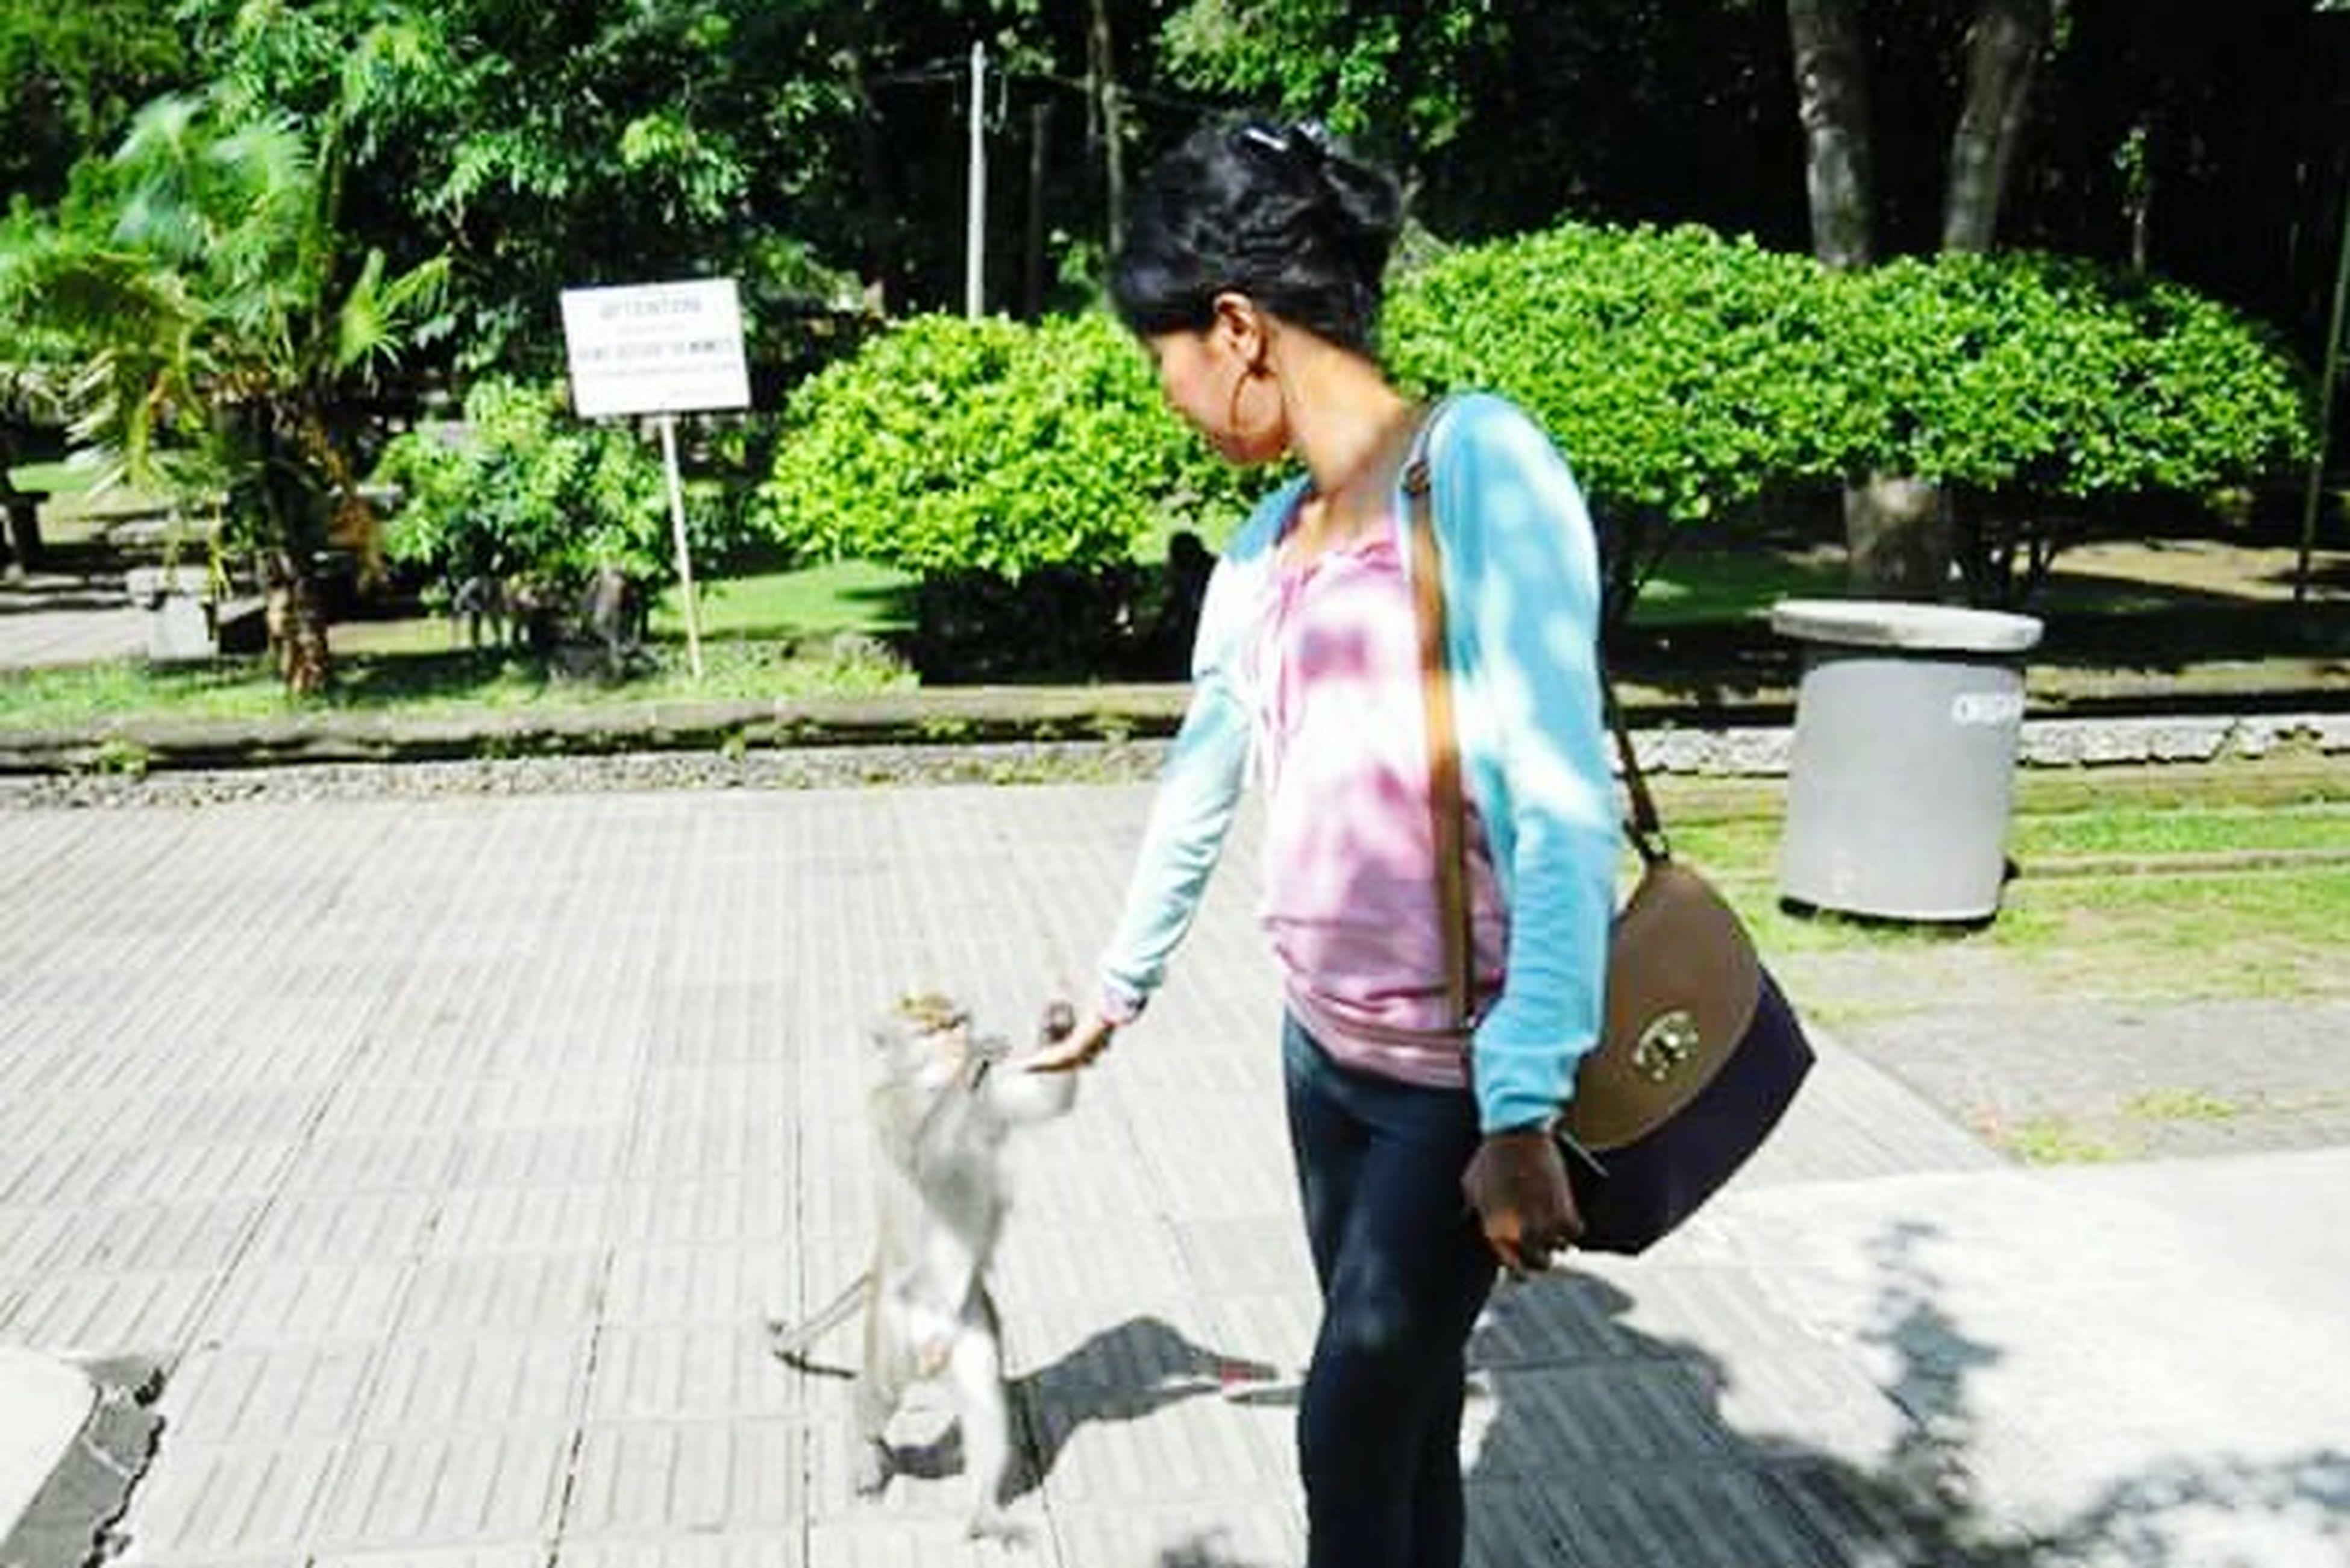 Me MonkeyForest Feeding The Animals Peanut ❤ Cute :) Bali Indonesia